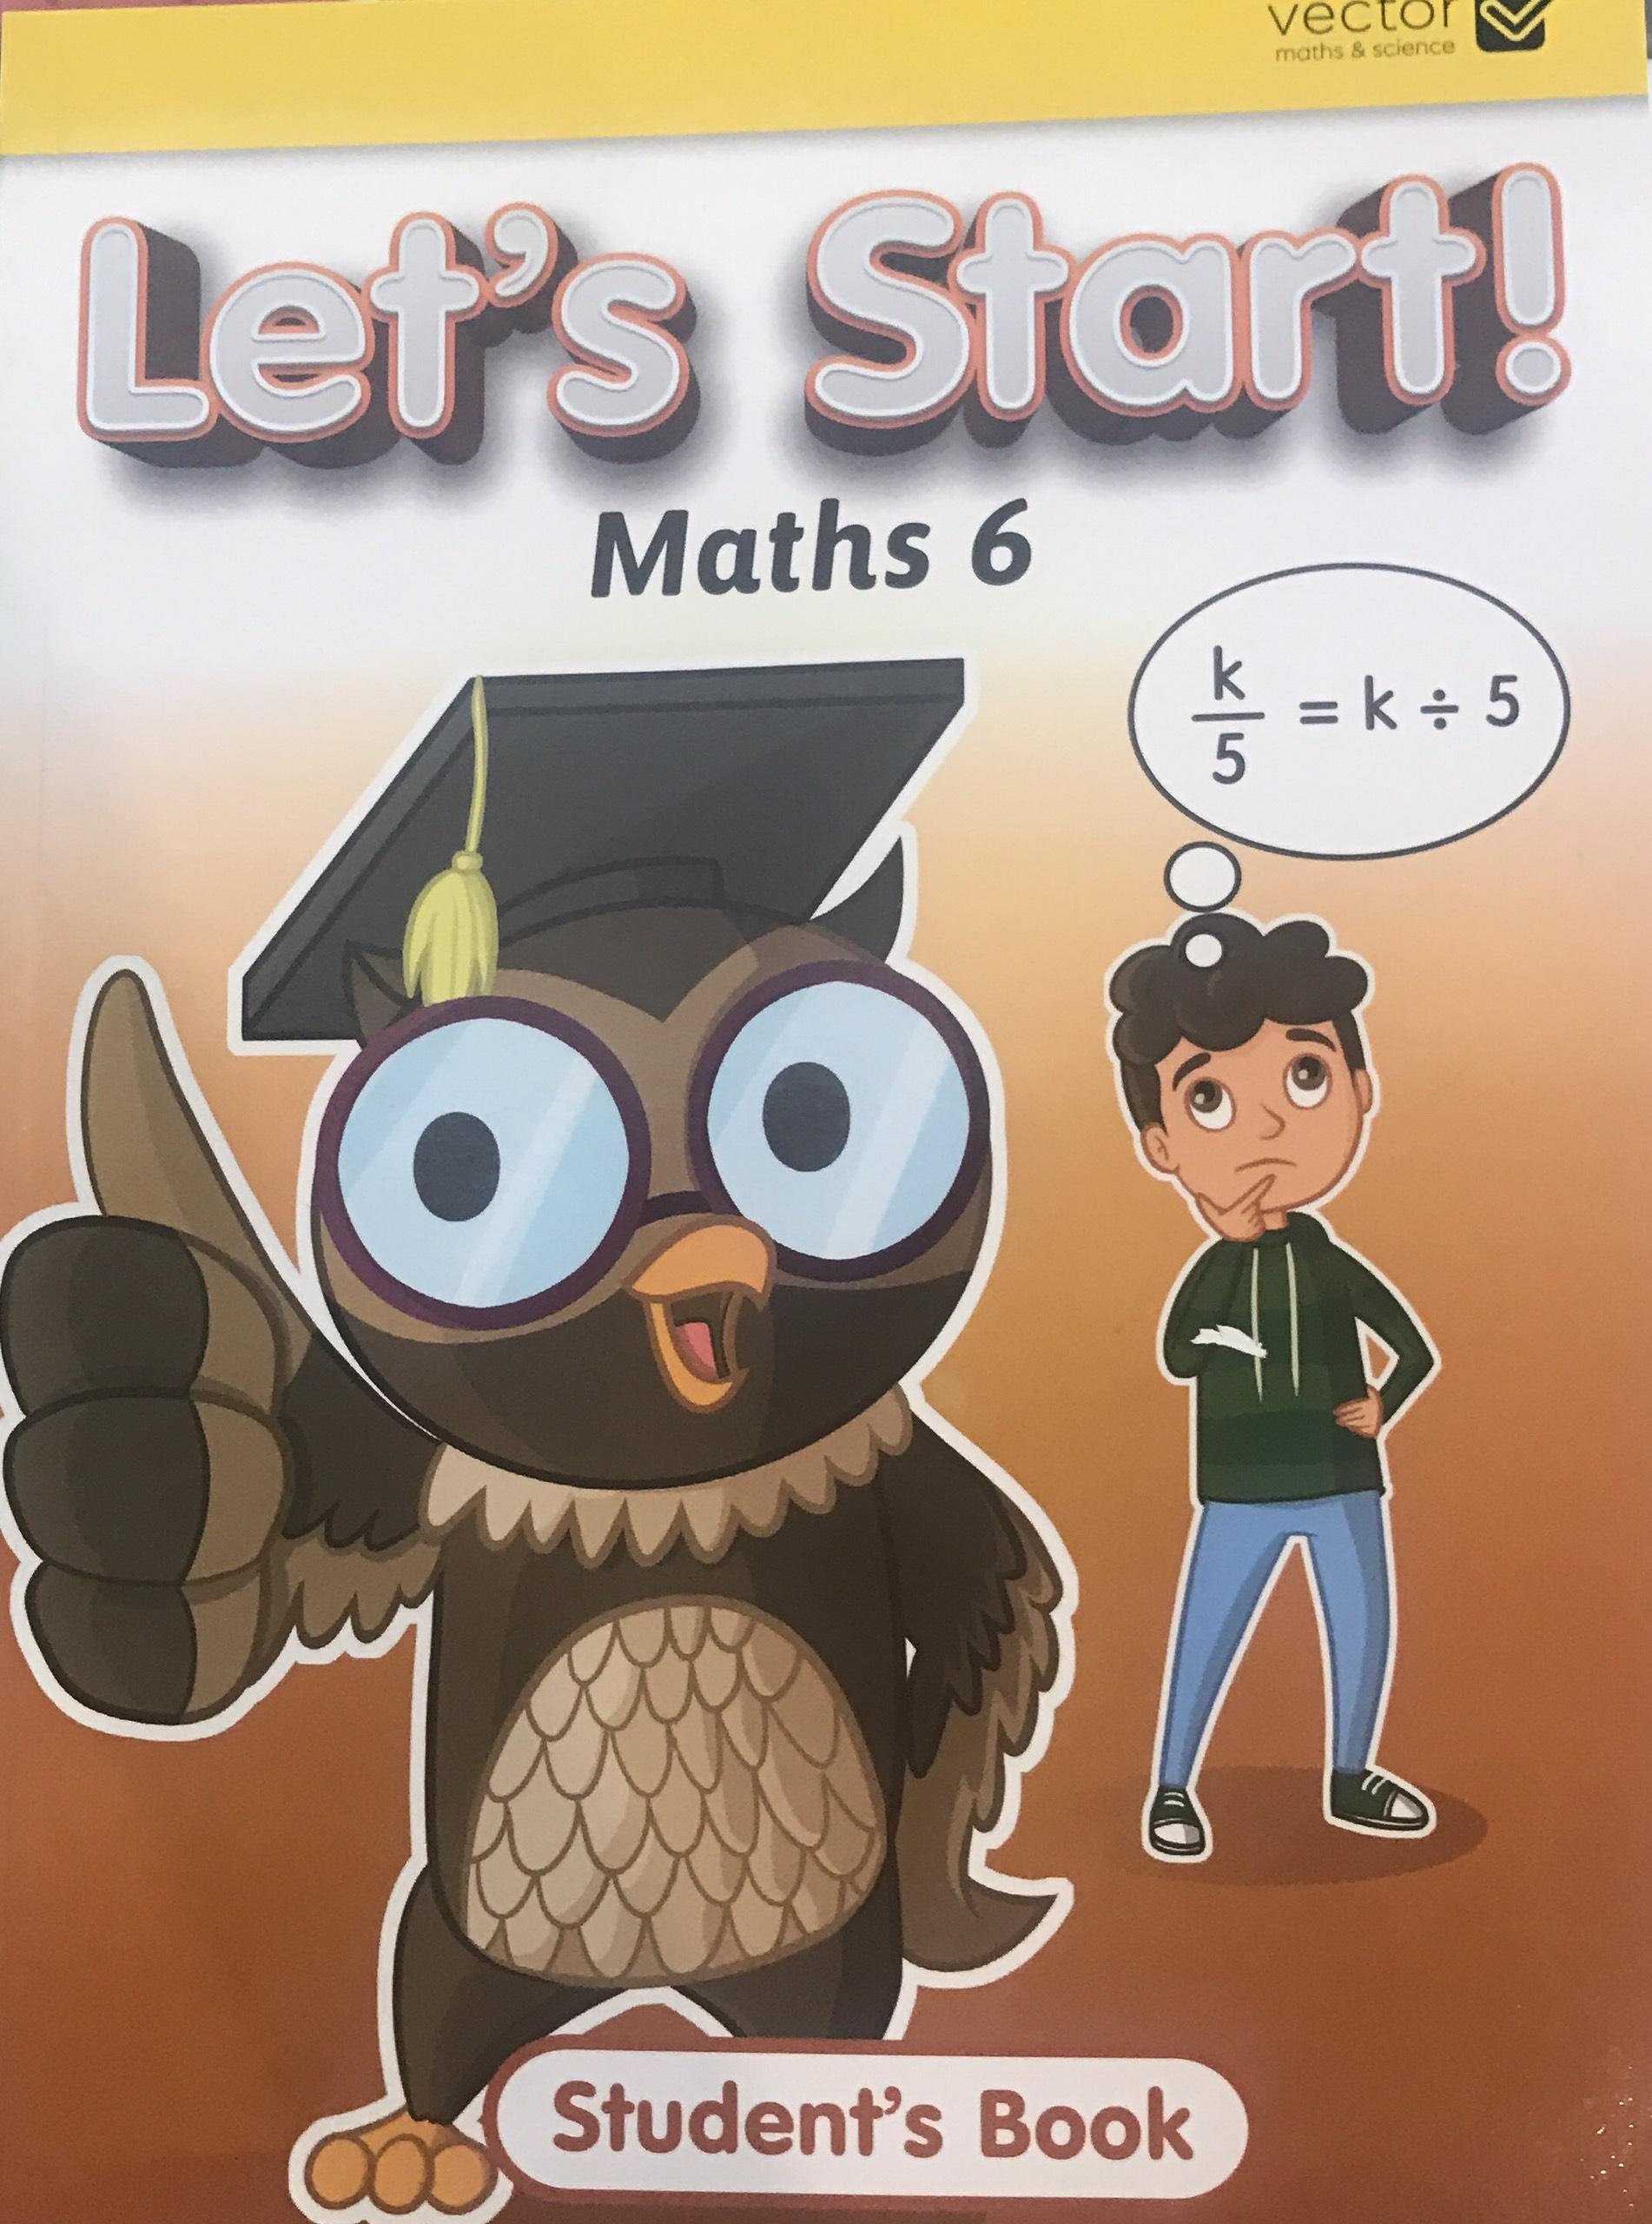 Vector: Sách hệ Singapore - Học toán bằng tiếng Anh - Let's Start Maths 6 Student's Book